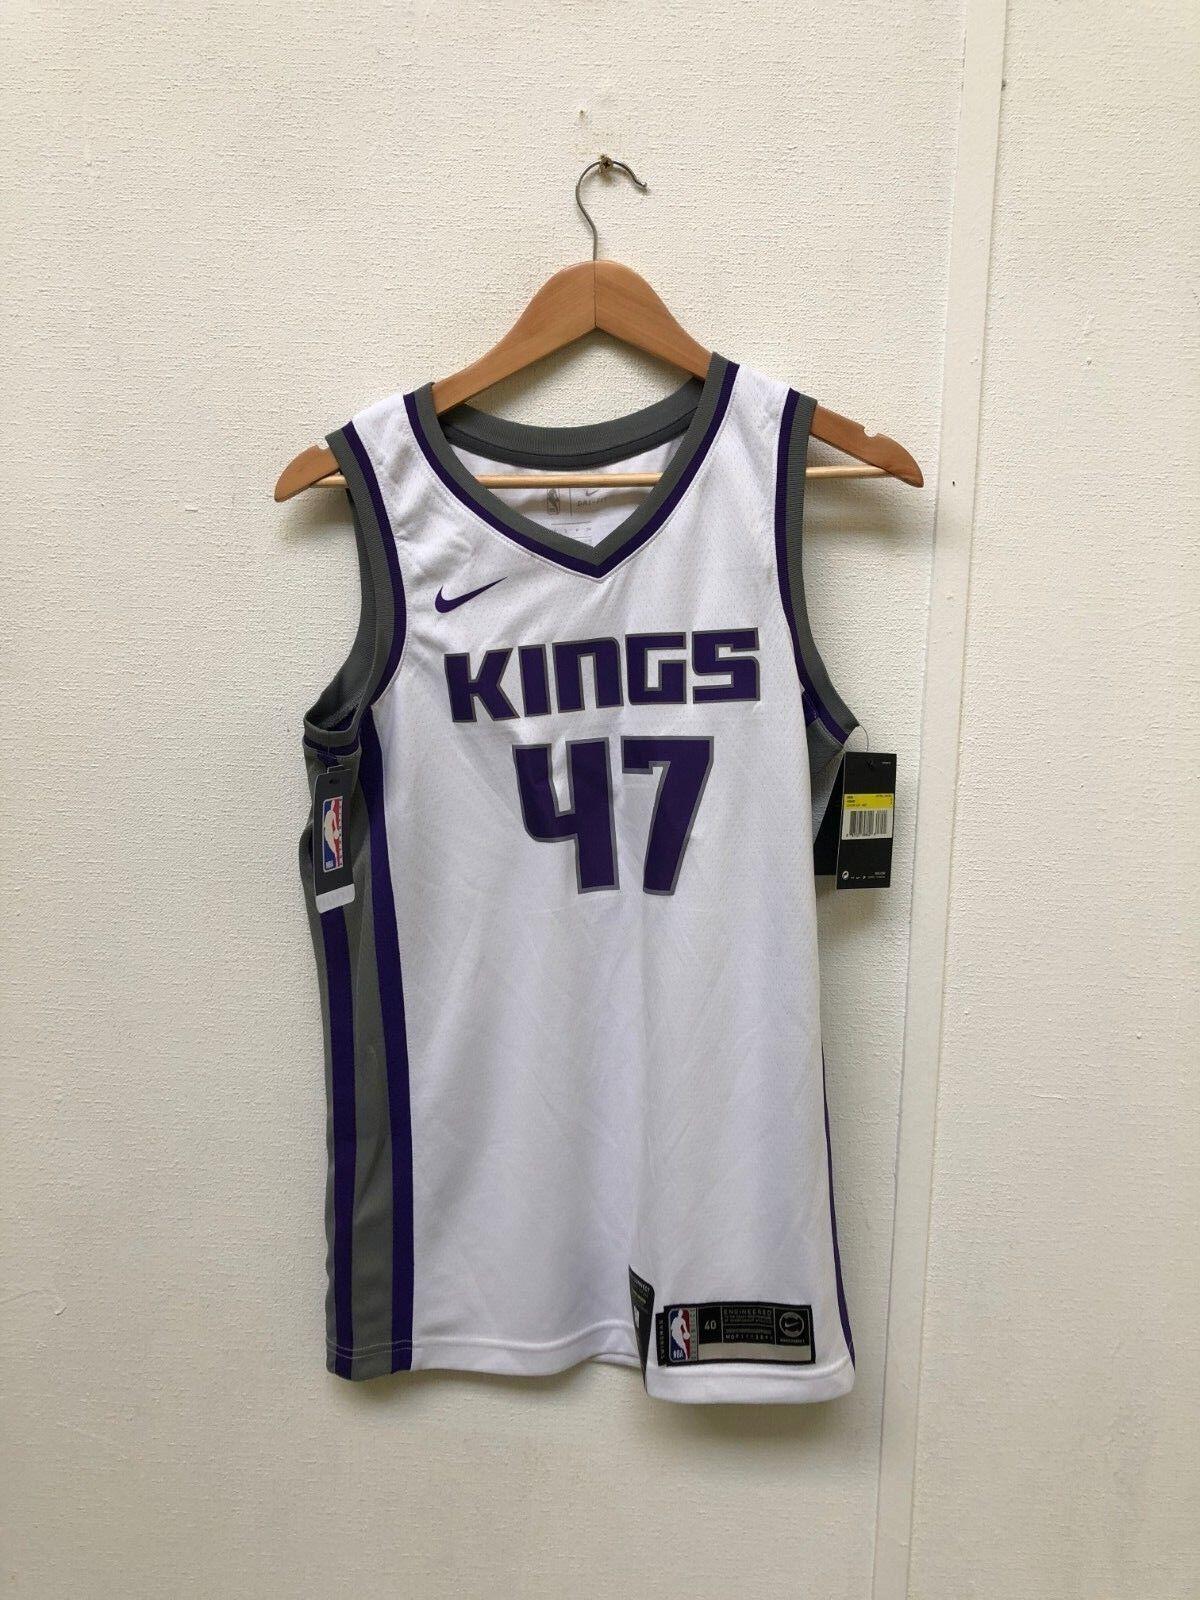 Nike Men's NBA Name-blanc-Neuf Sacramento Kings 2018 Home Jersey-Small-No Name-blanc-Neuf NBA e33797